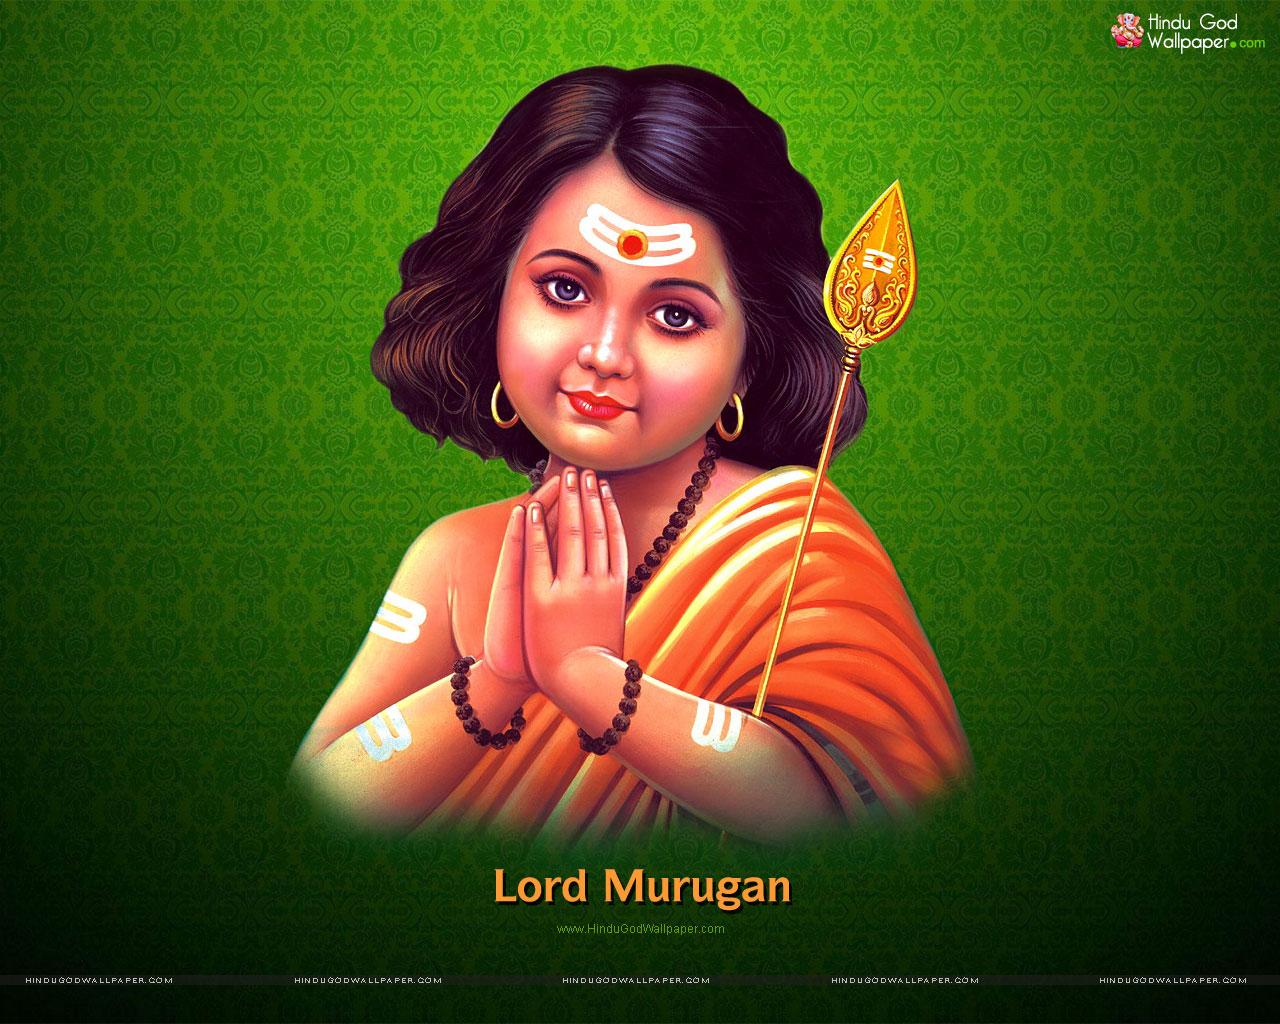 Bala murugan wallpapers images free download thecheapjerseys Gallery